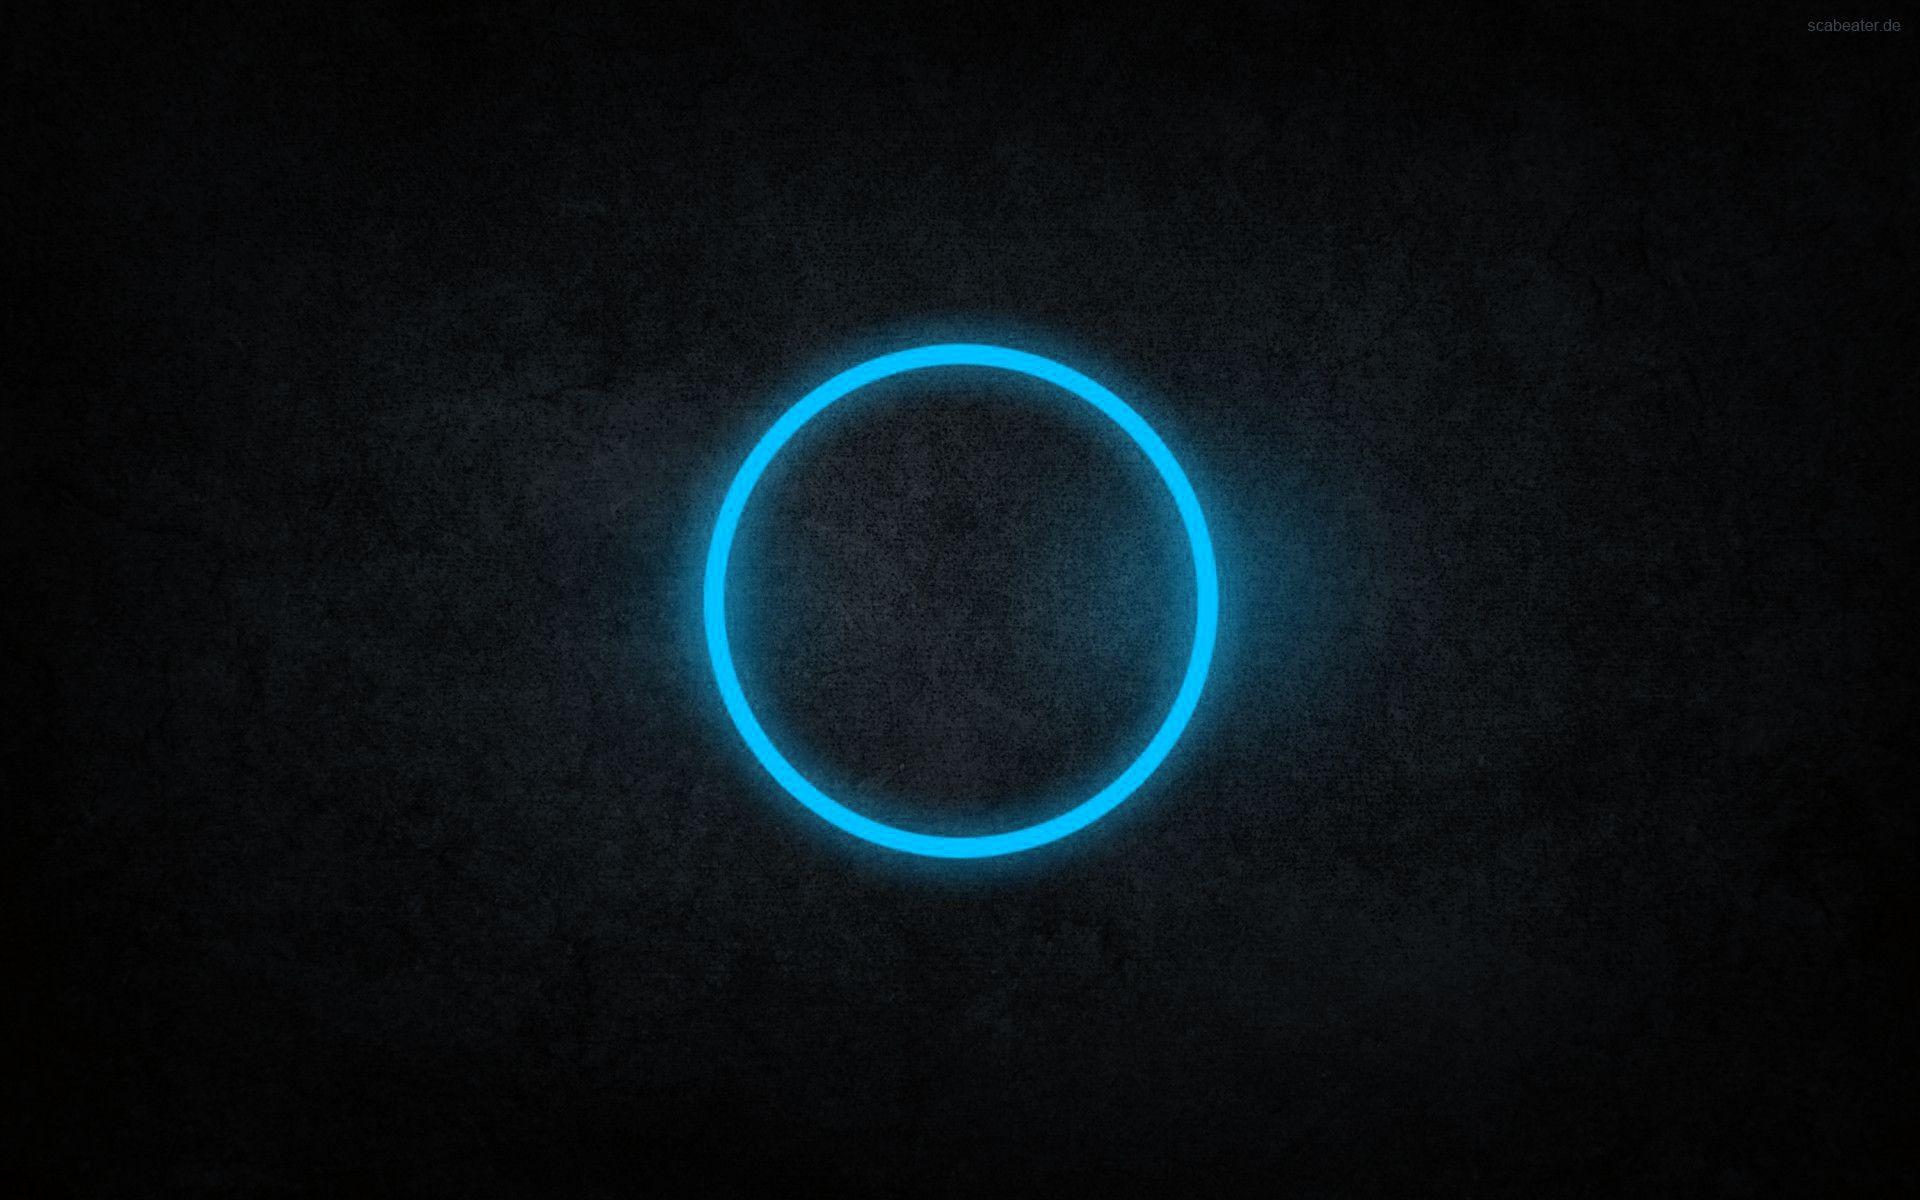 Abstract Black Blue Circles Cyan Wallpaper 1356336 Wallbase Cc Dark Black Wallpaper Neon Wallpaper Black Hd Wallpaper